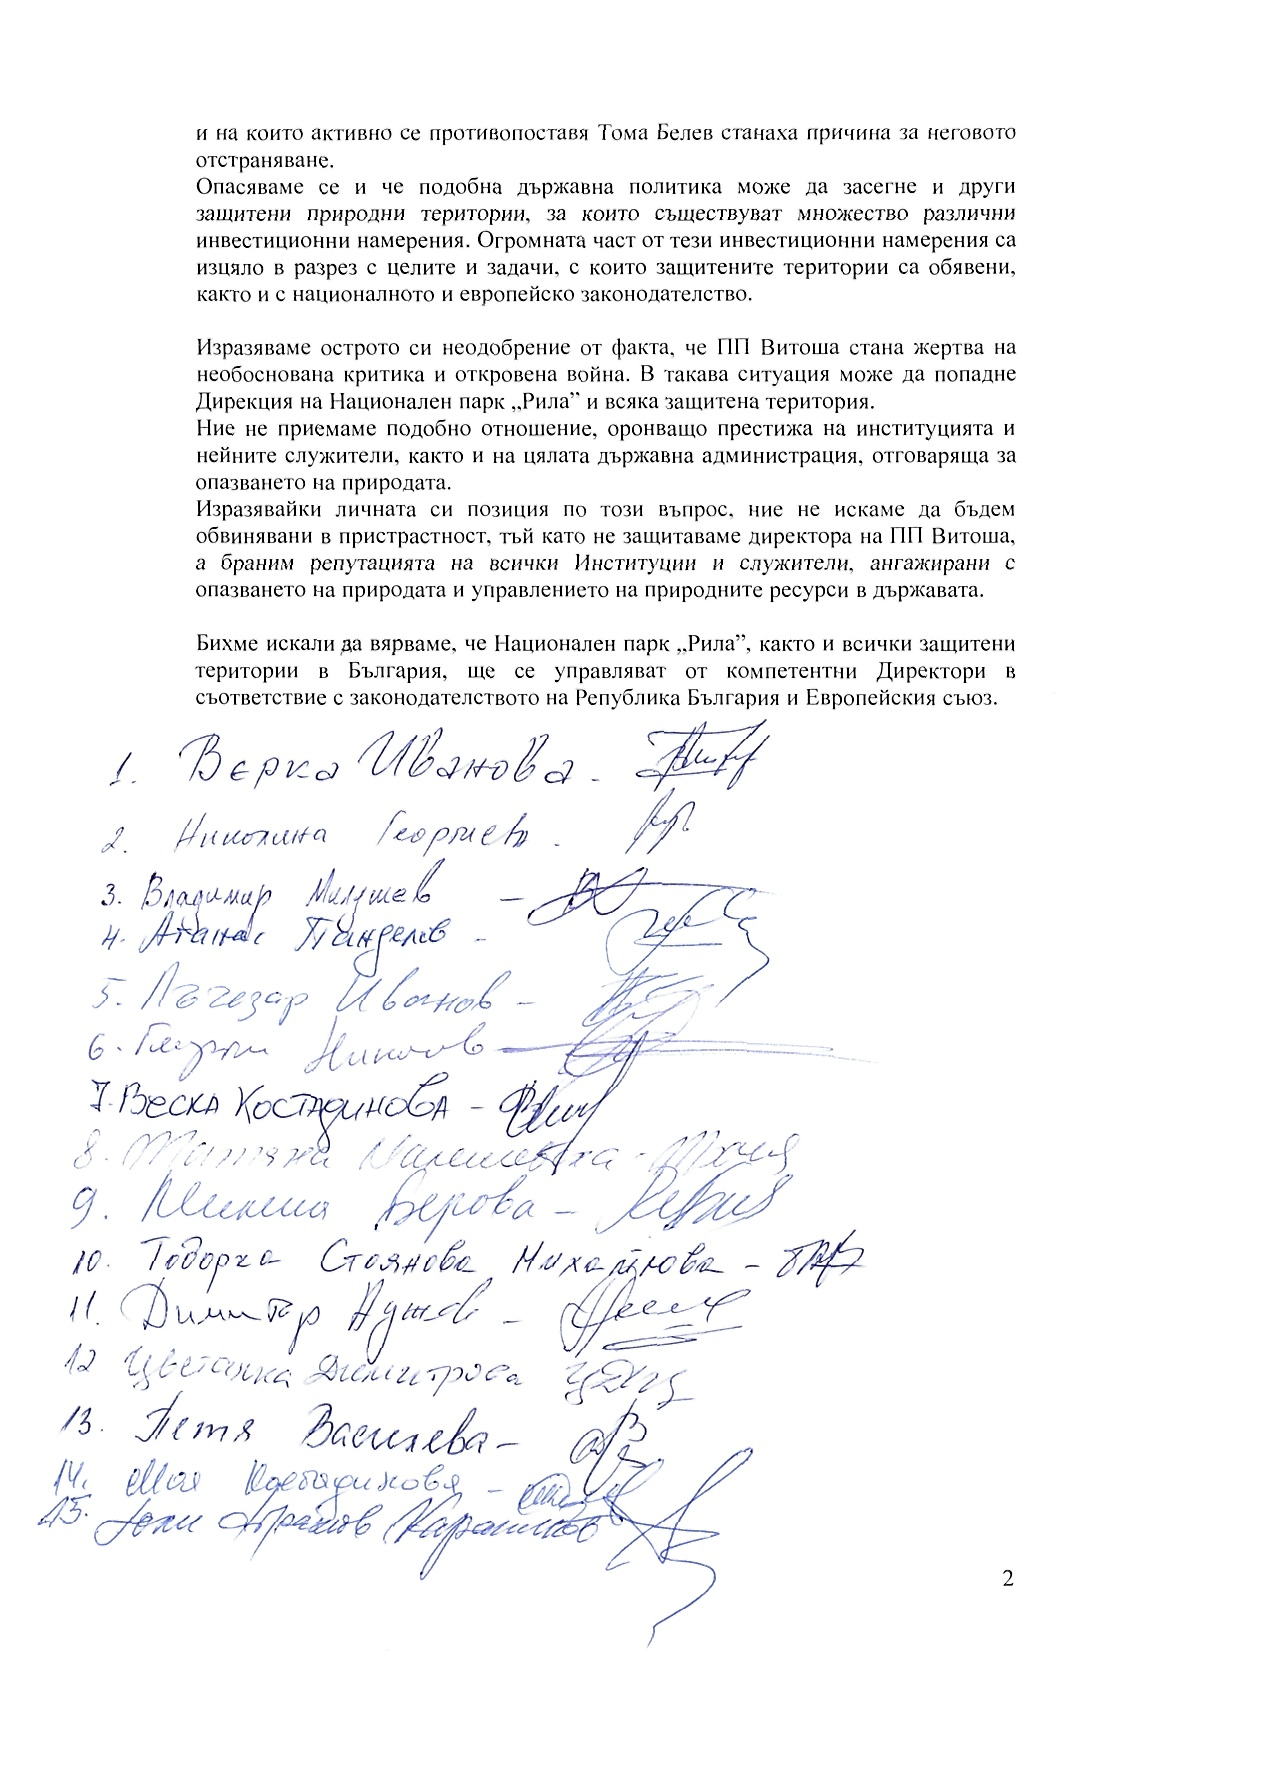 Pismo-Director-PP-Vitosha_DNP_Rila-2